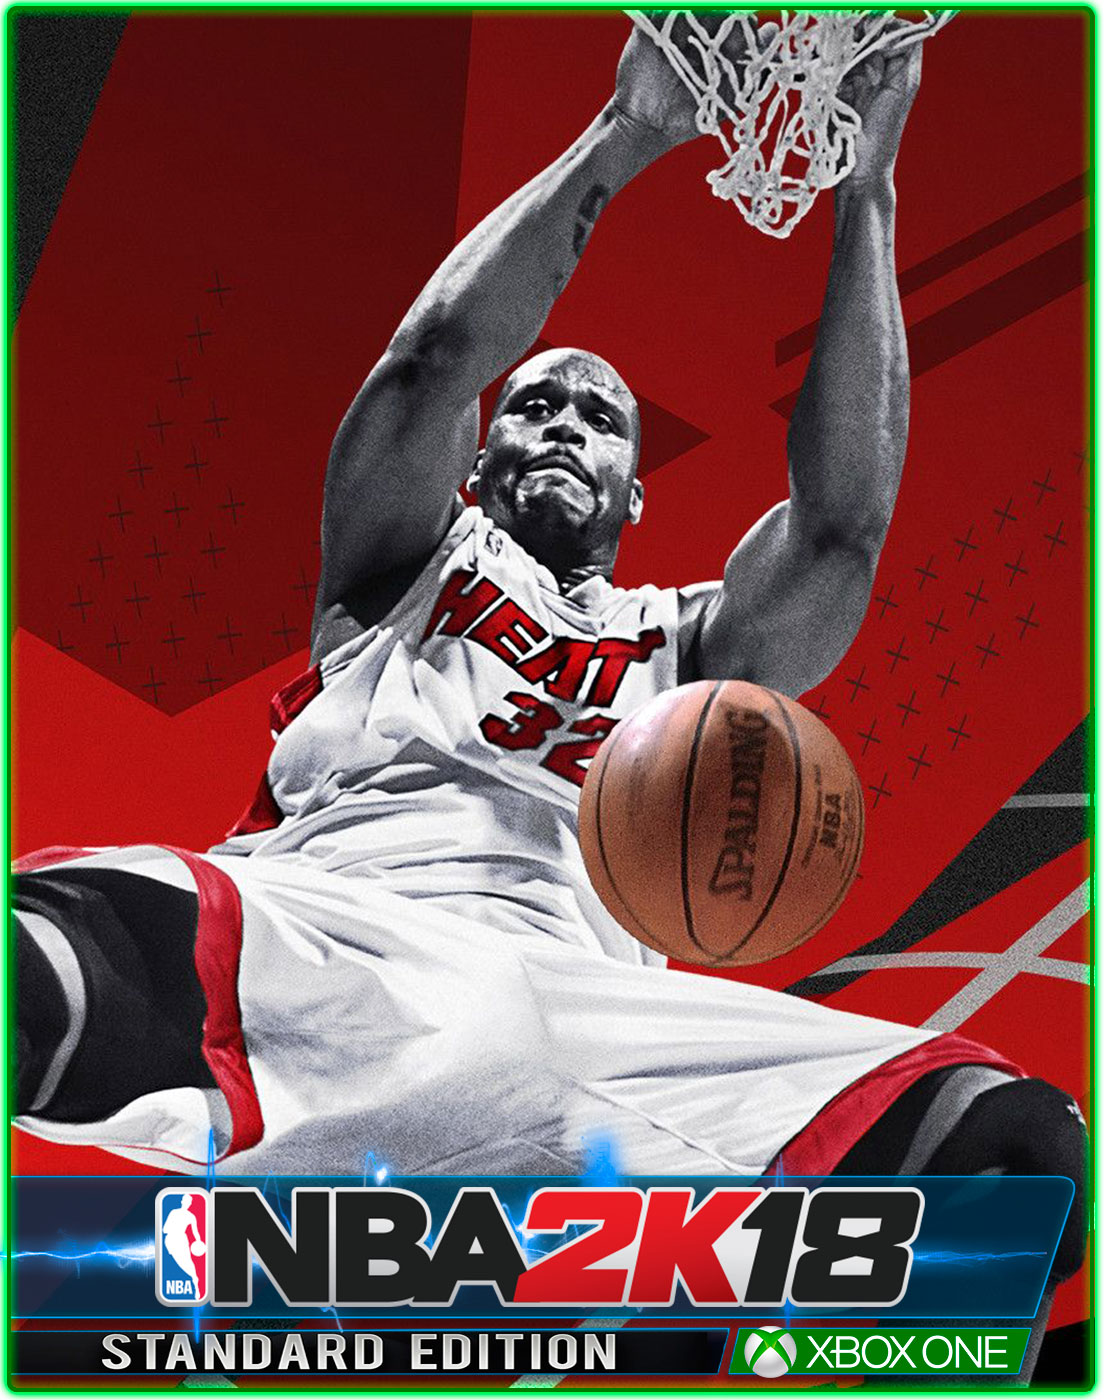 Nba 2K18 Standard Edition - Xbox One - buybest4u.com